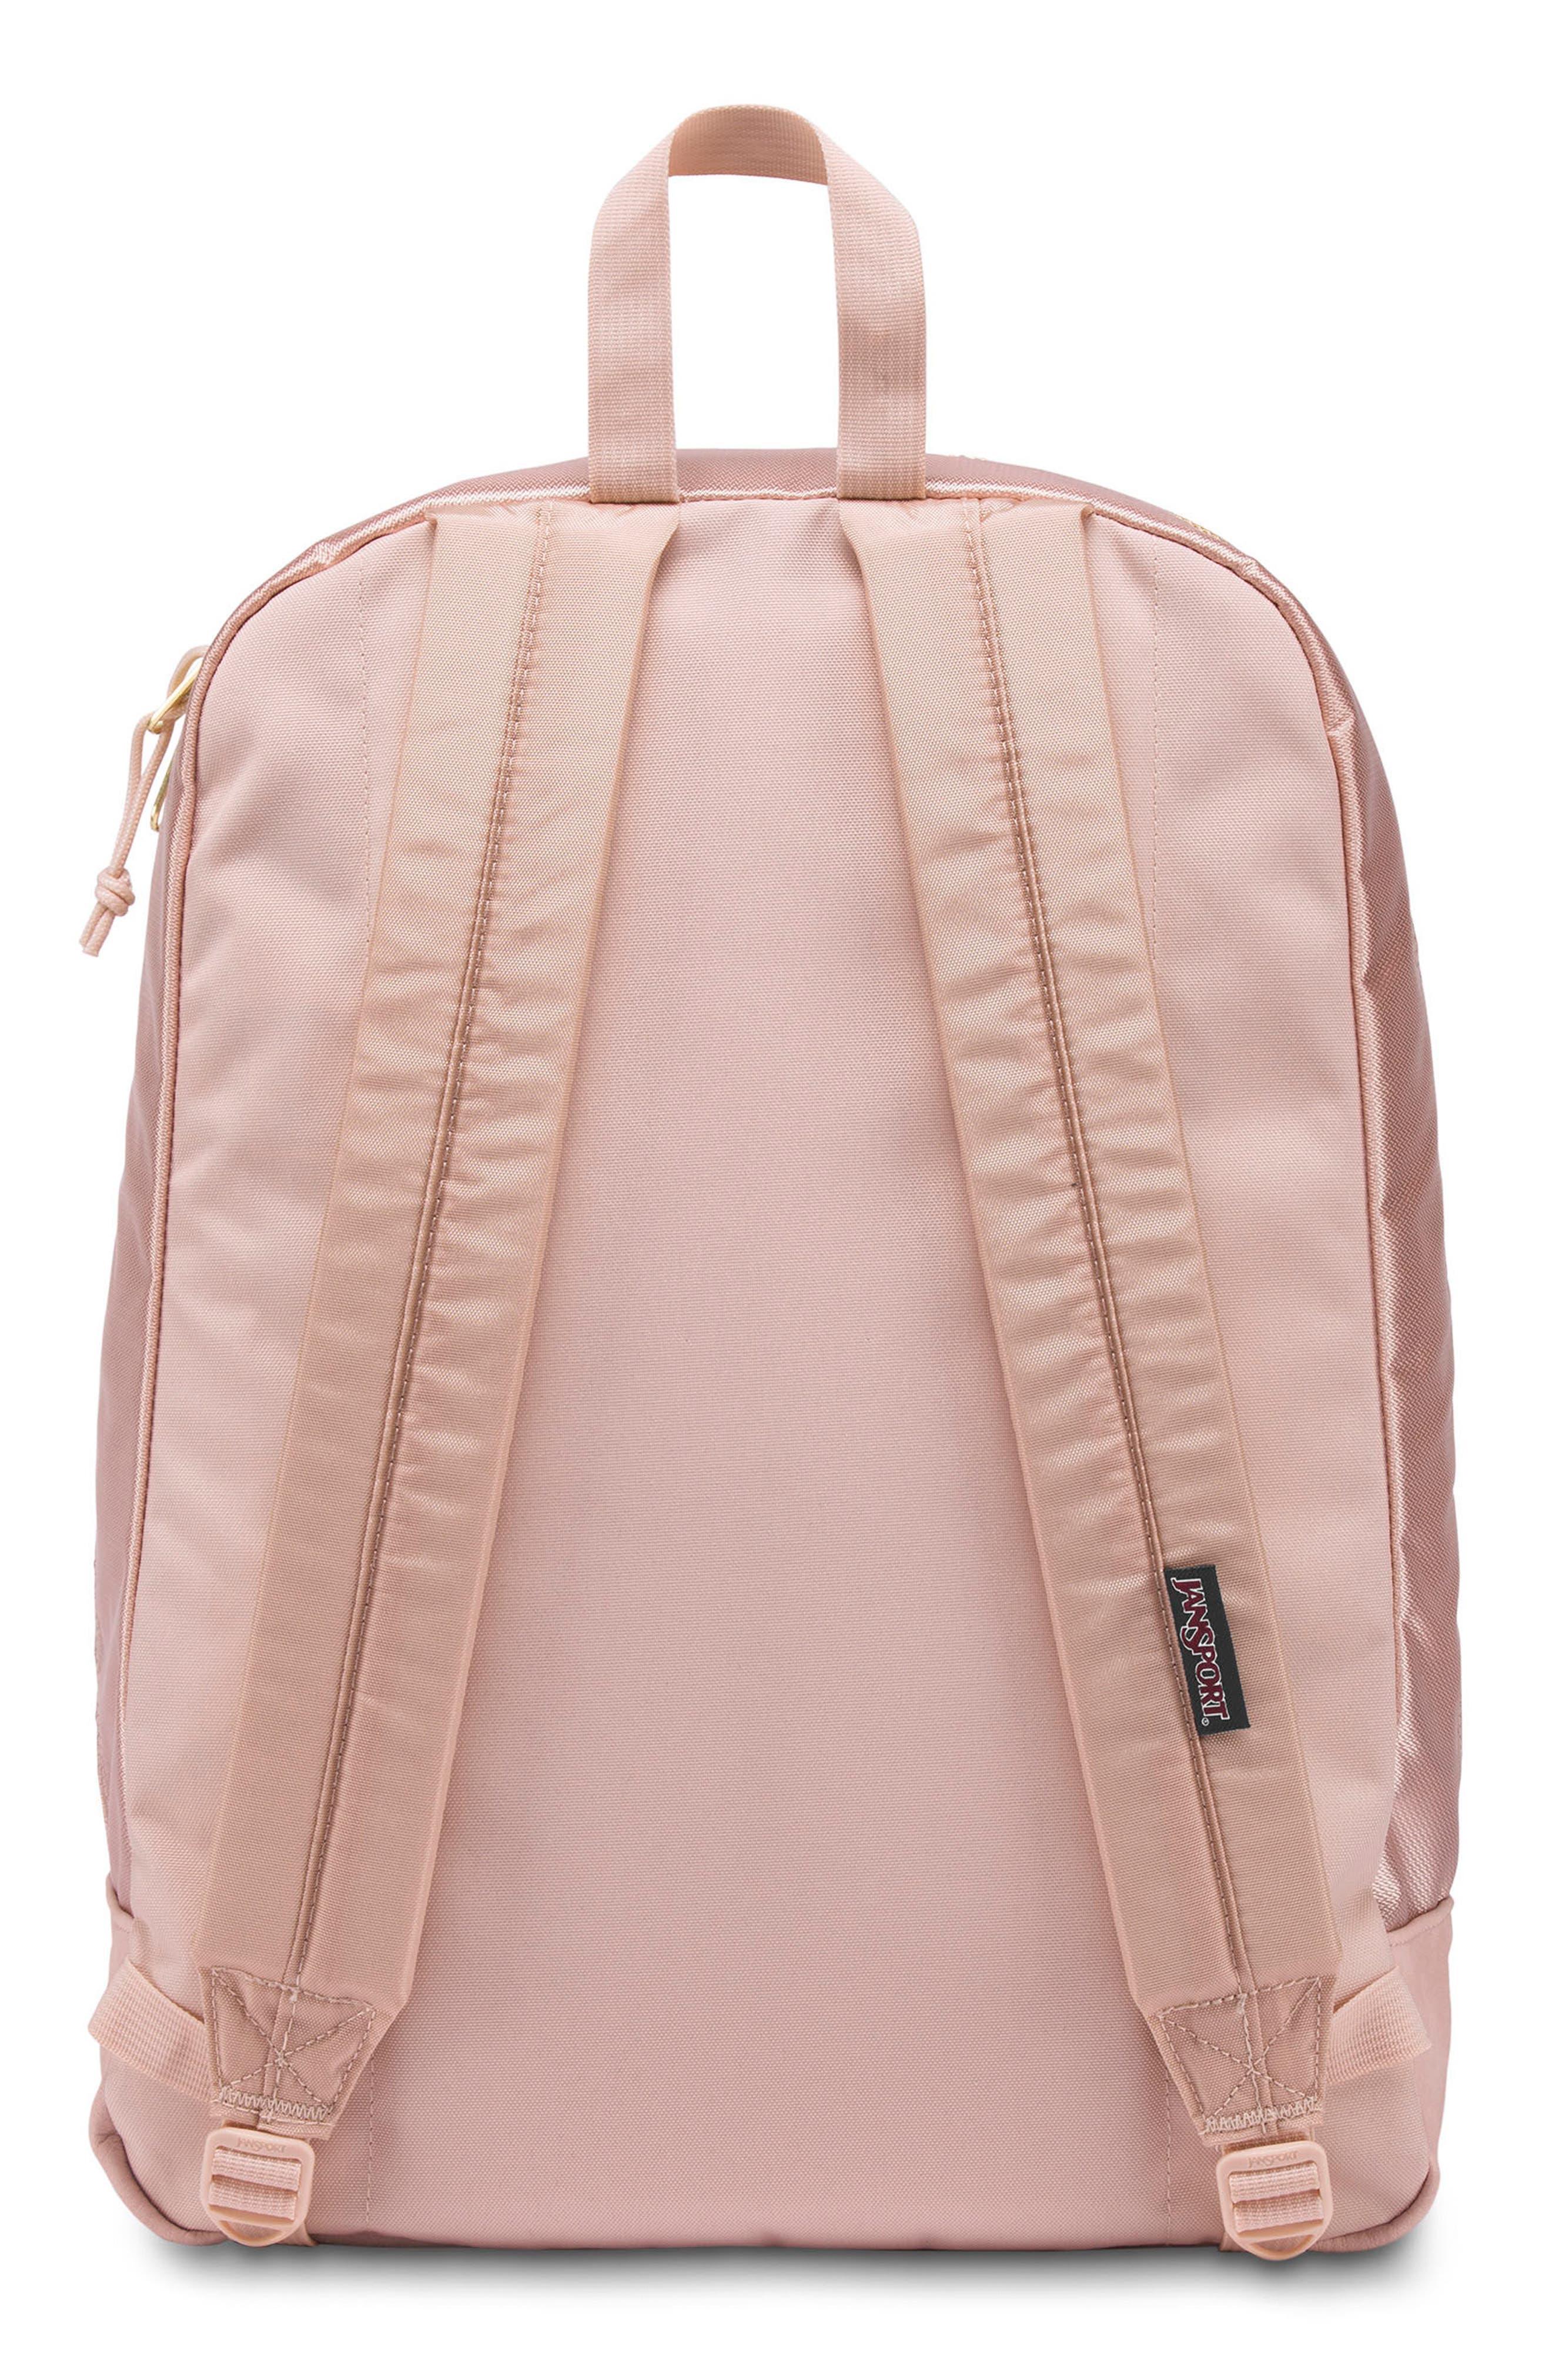 Super FX Gym Backpack,                             Alternate thumbnail 2, color,                             ROSE SMOKE GOLD